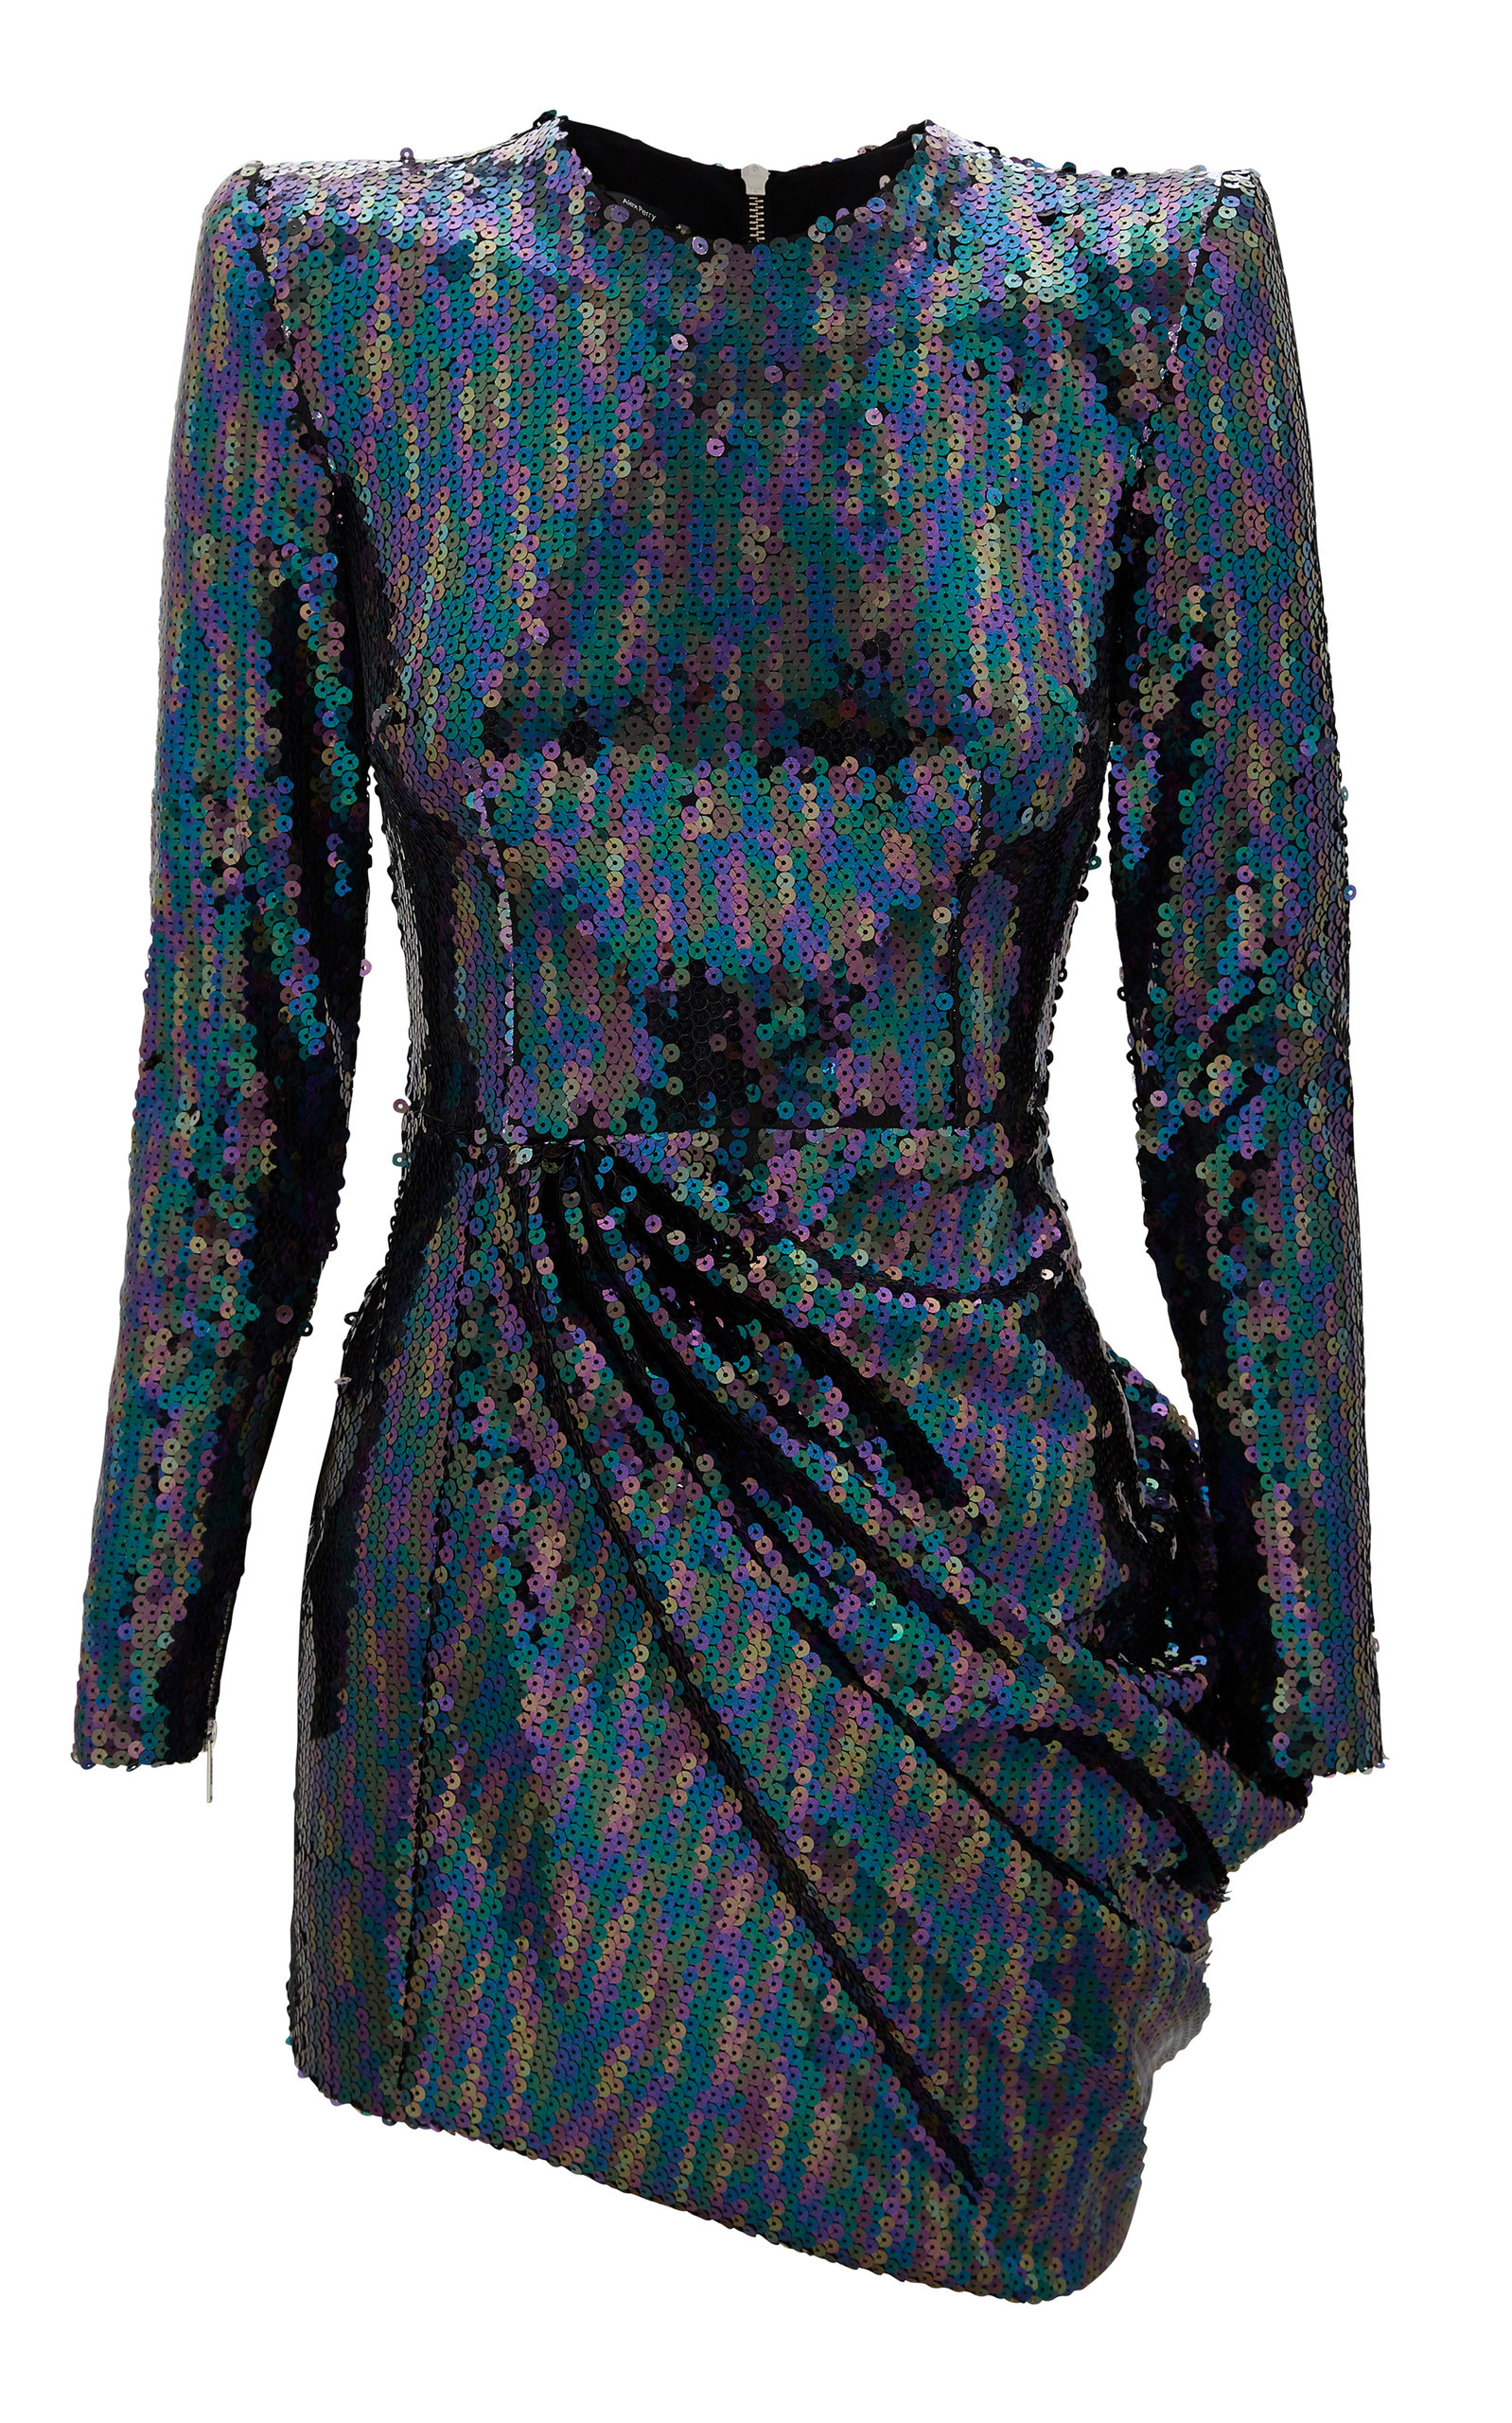 0262389c699 Iris Draped Sequin Mini Dress by Alex Perry